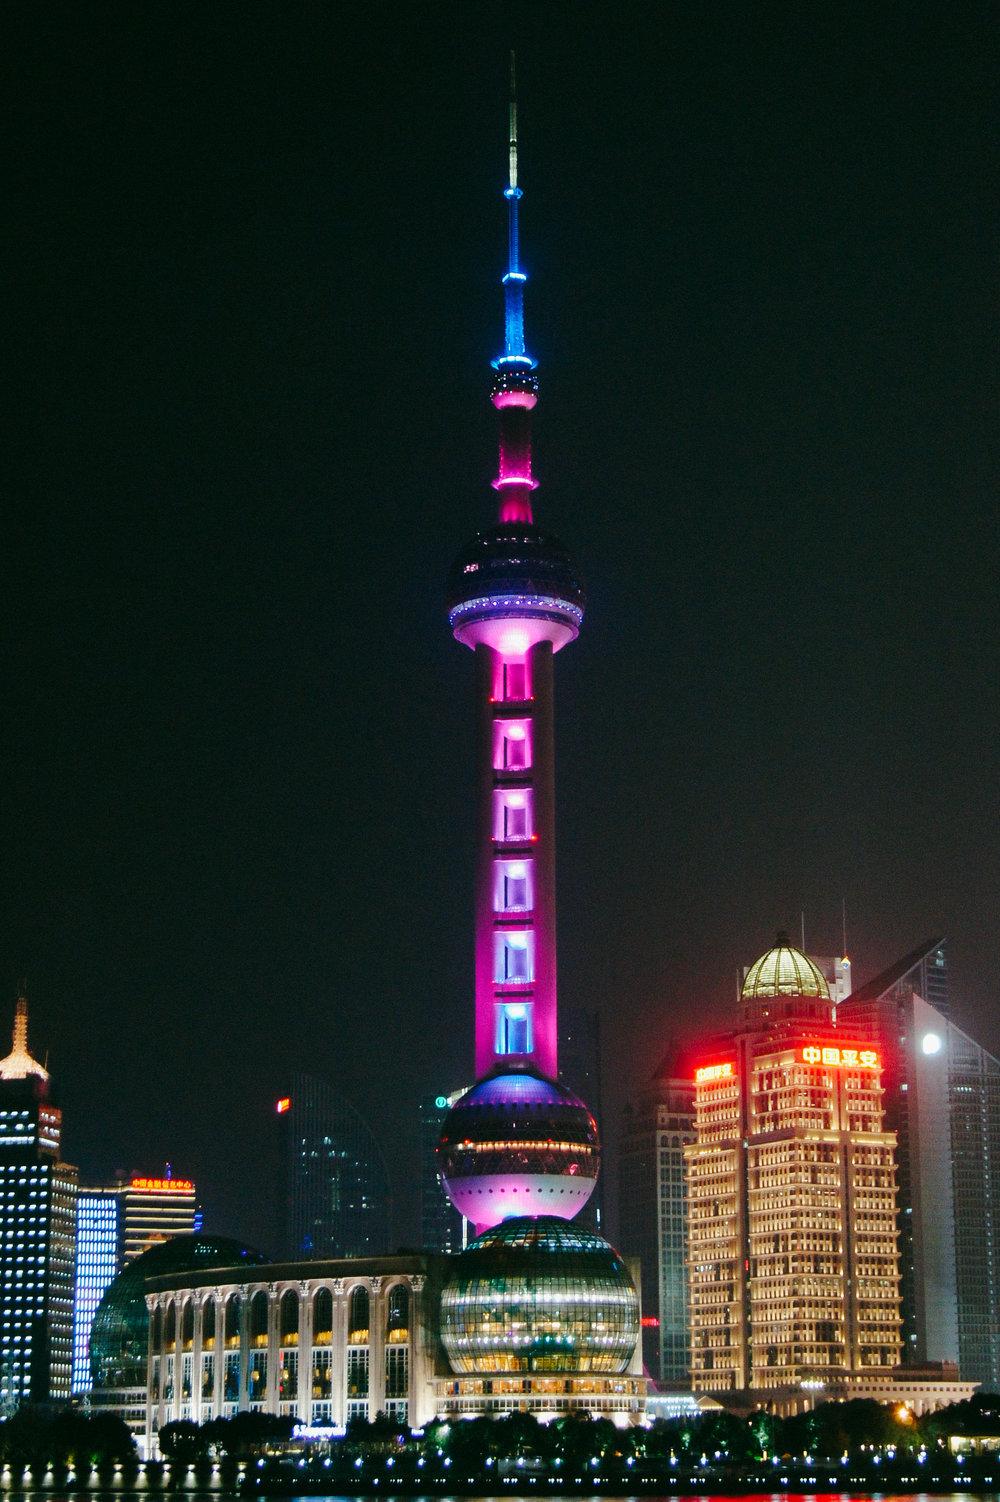 wwgh.life shanghai